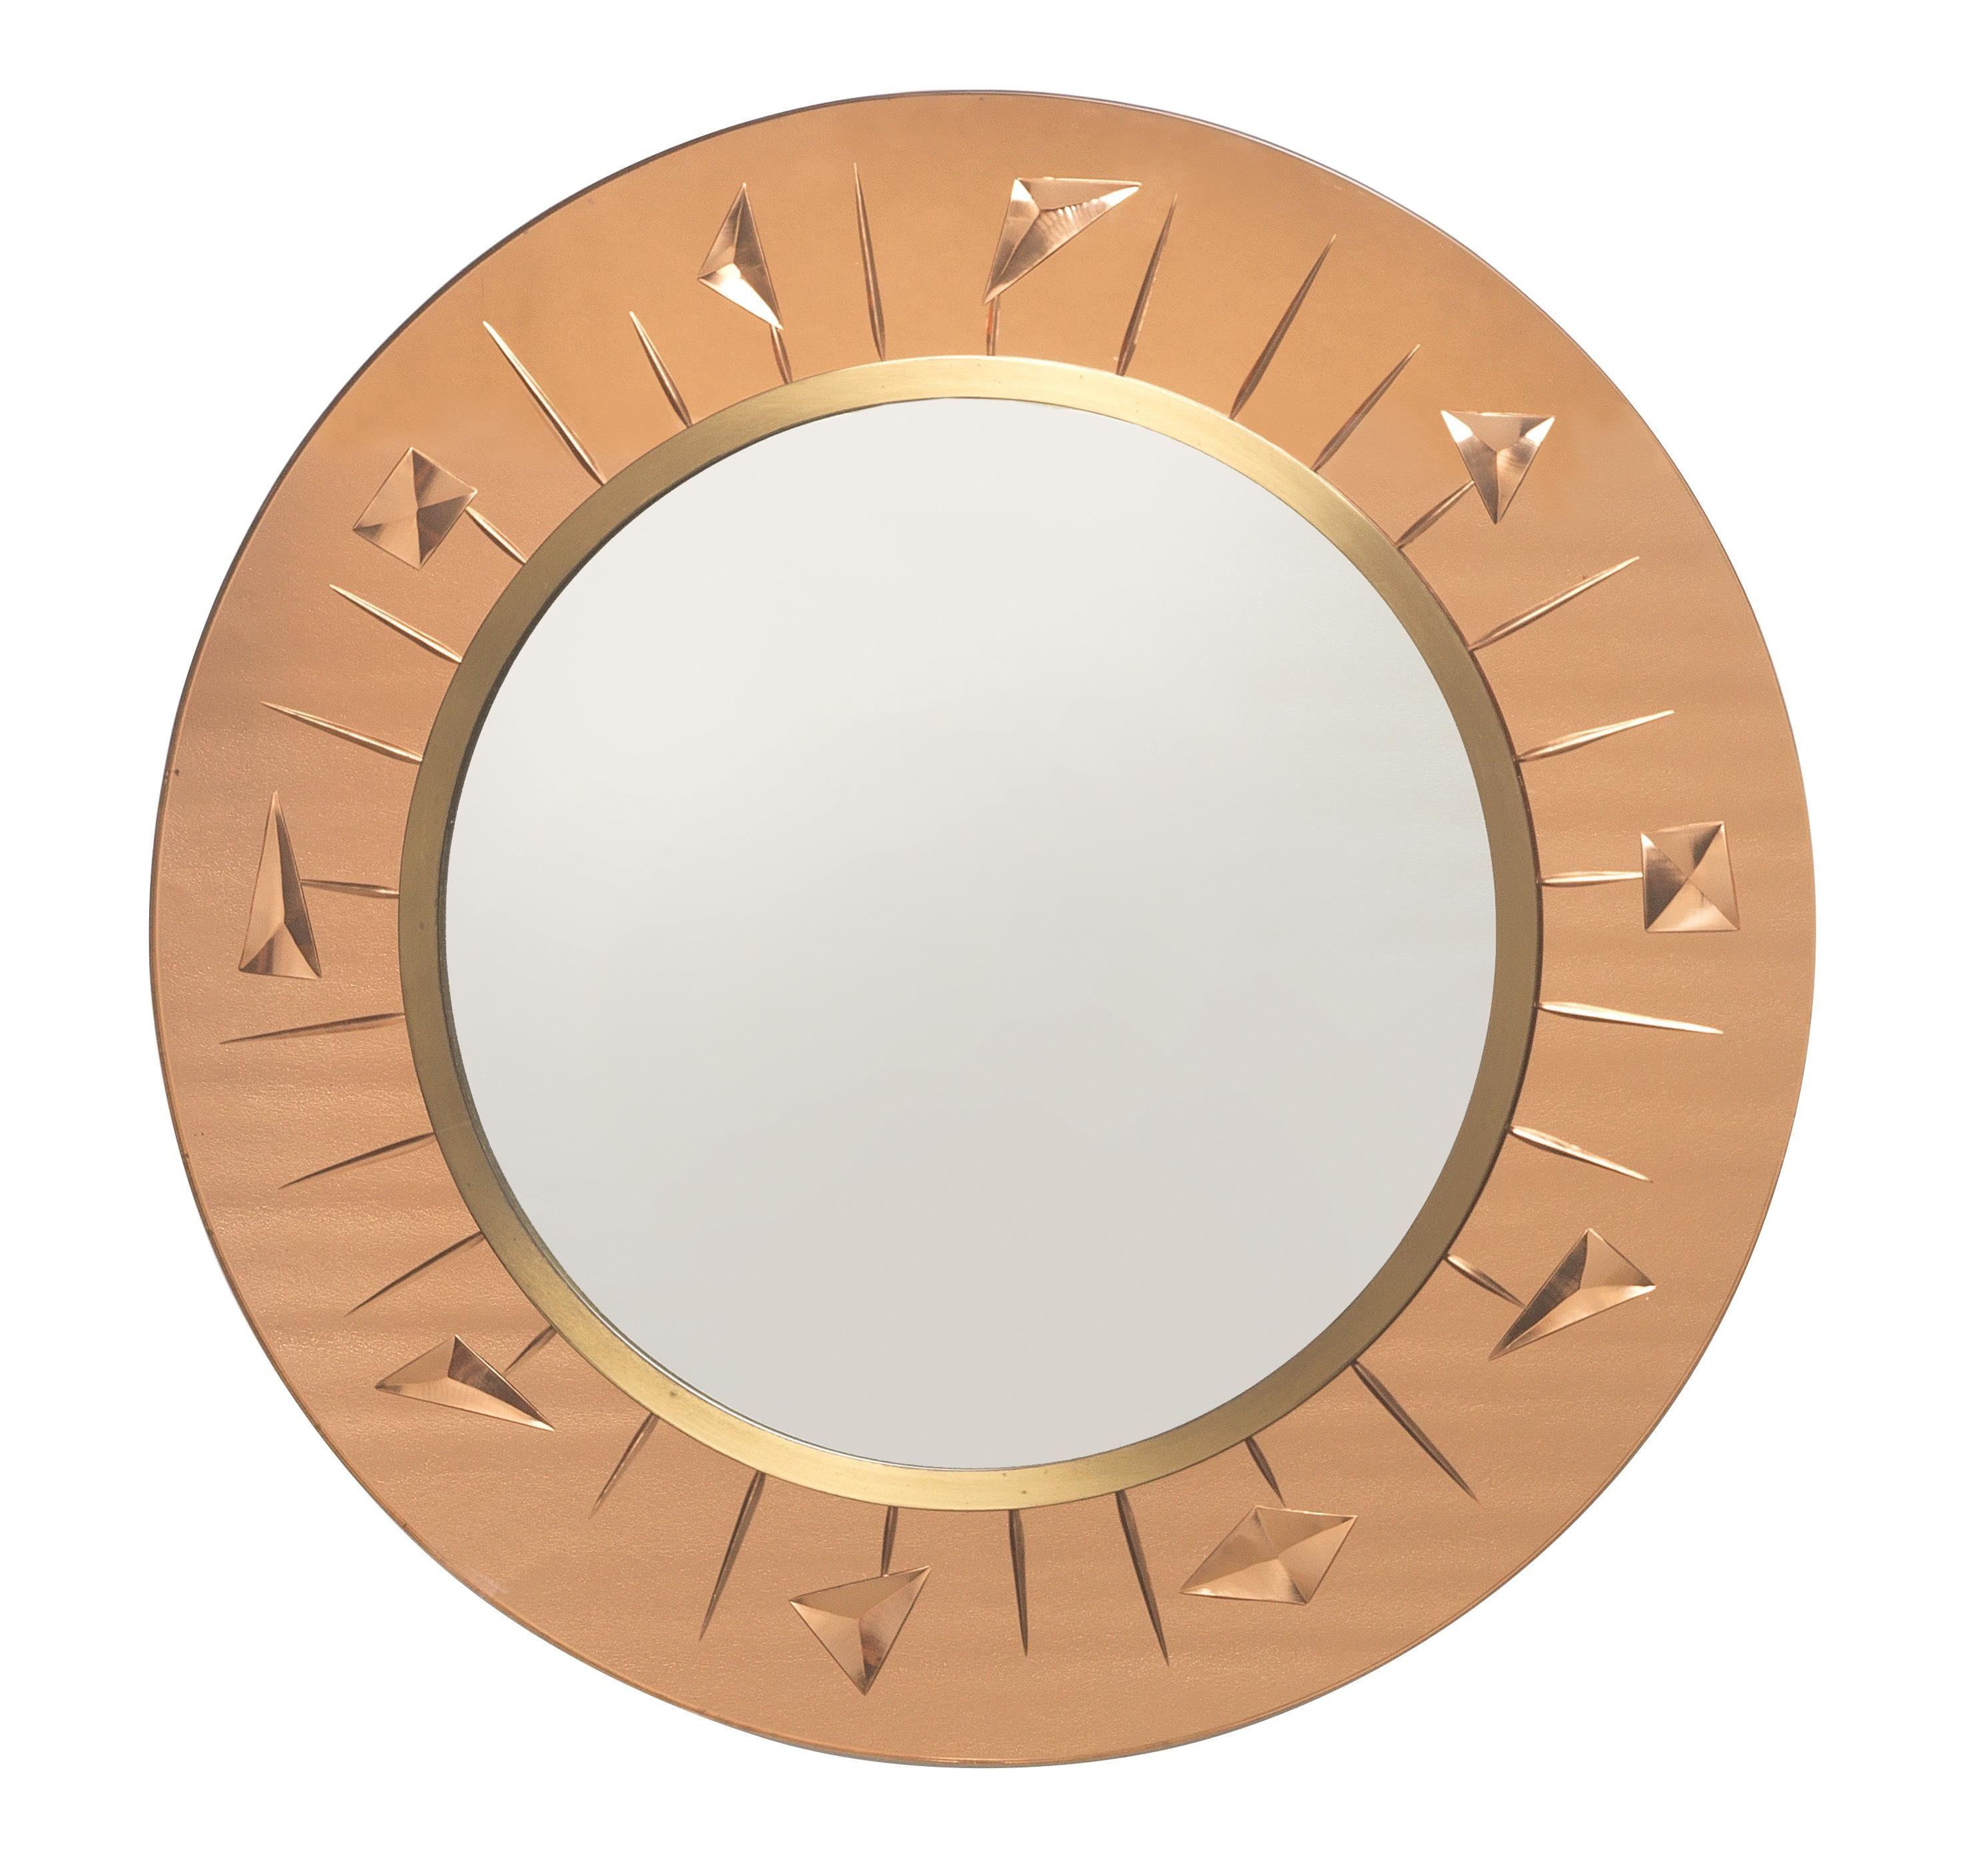 A Round Wall Mirror Cristal Art Round Wall Mirror Mirror Wall Mirror